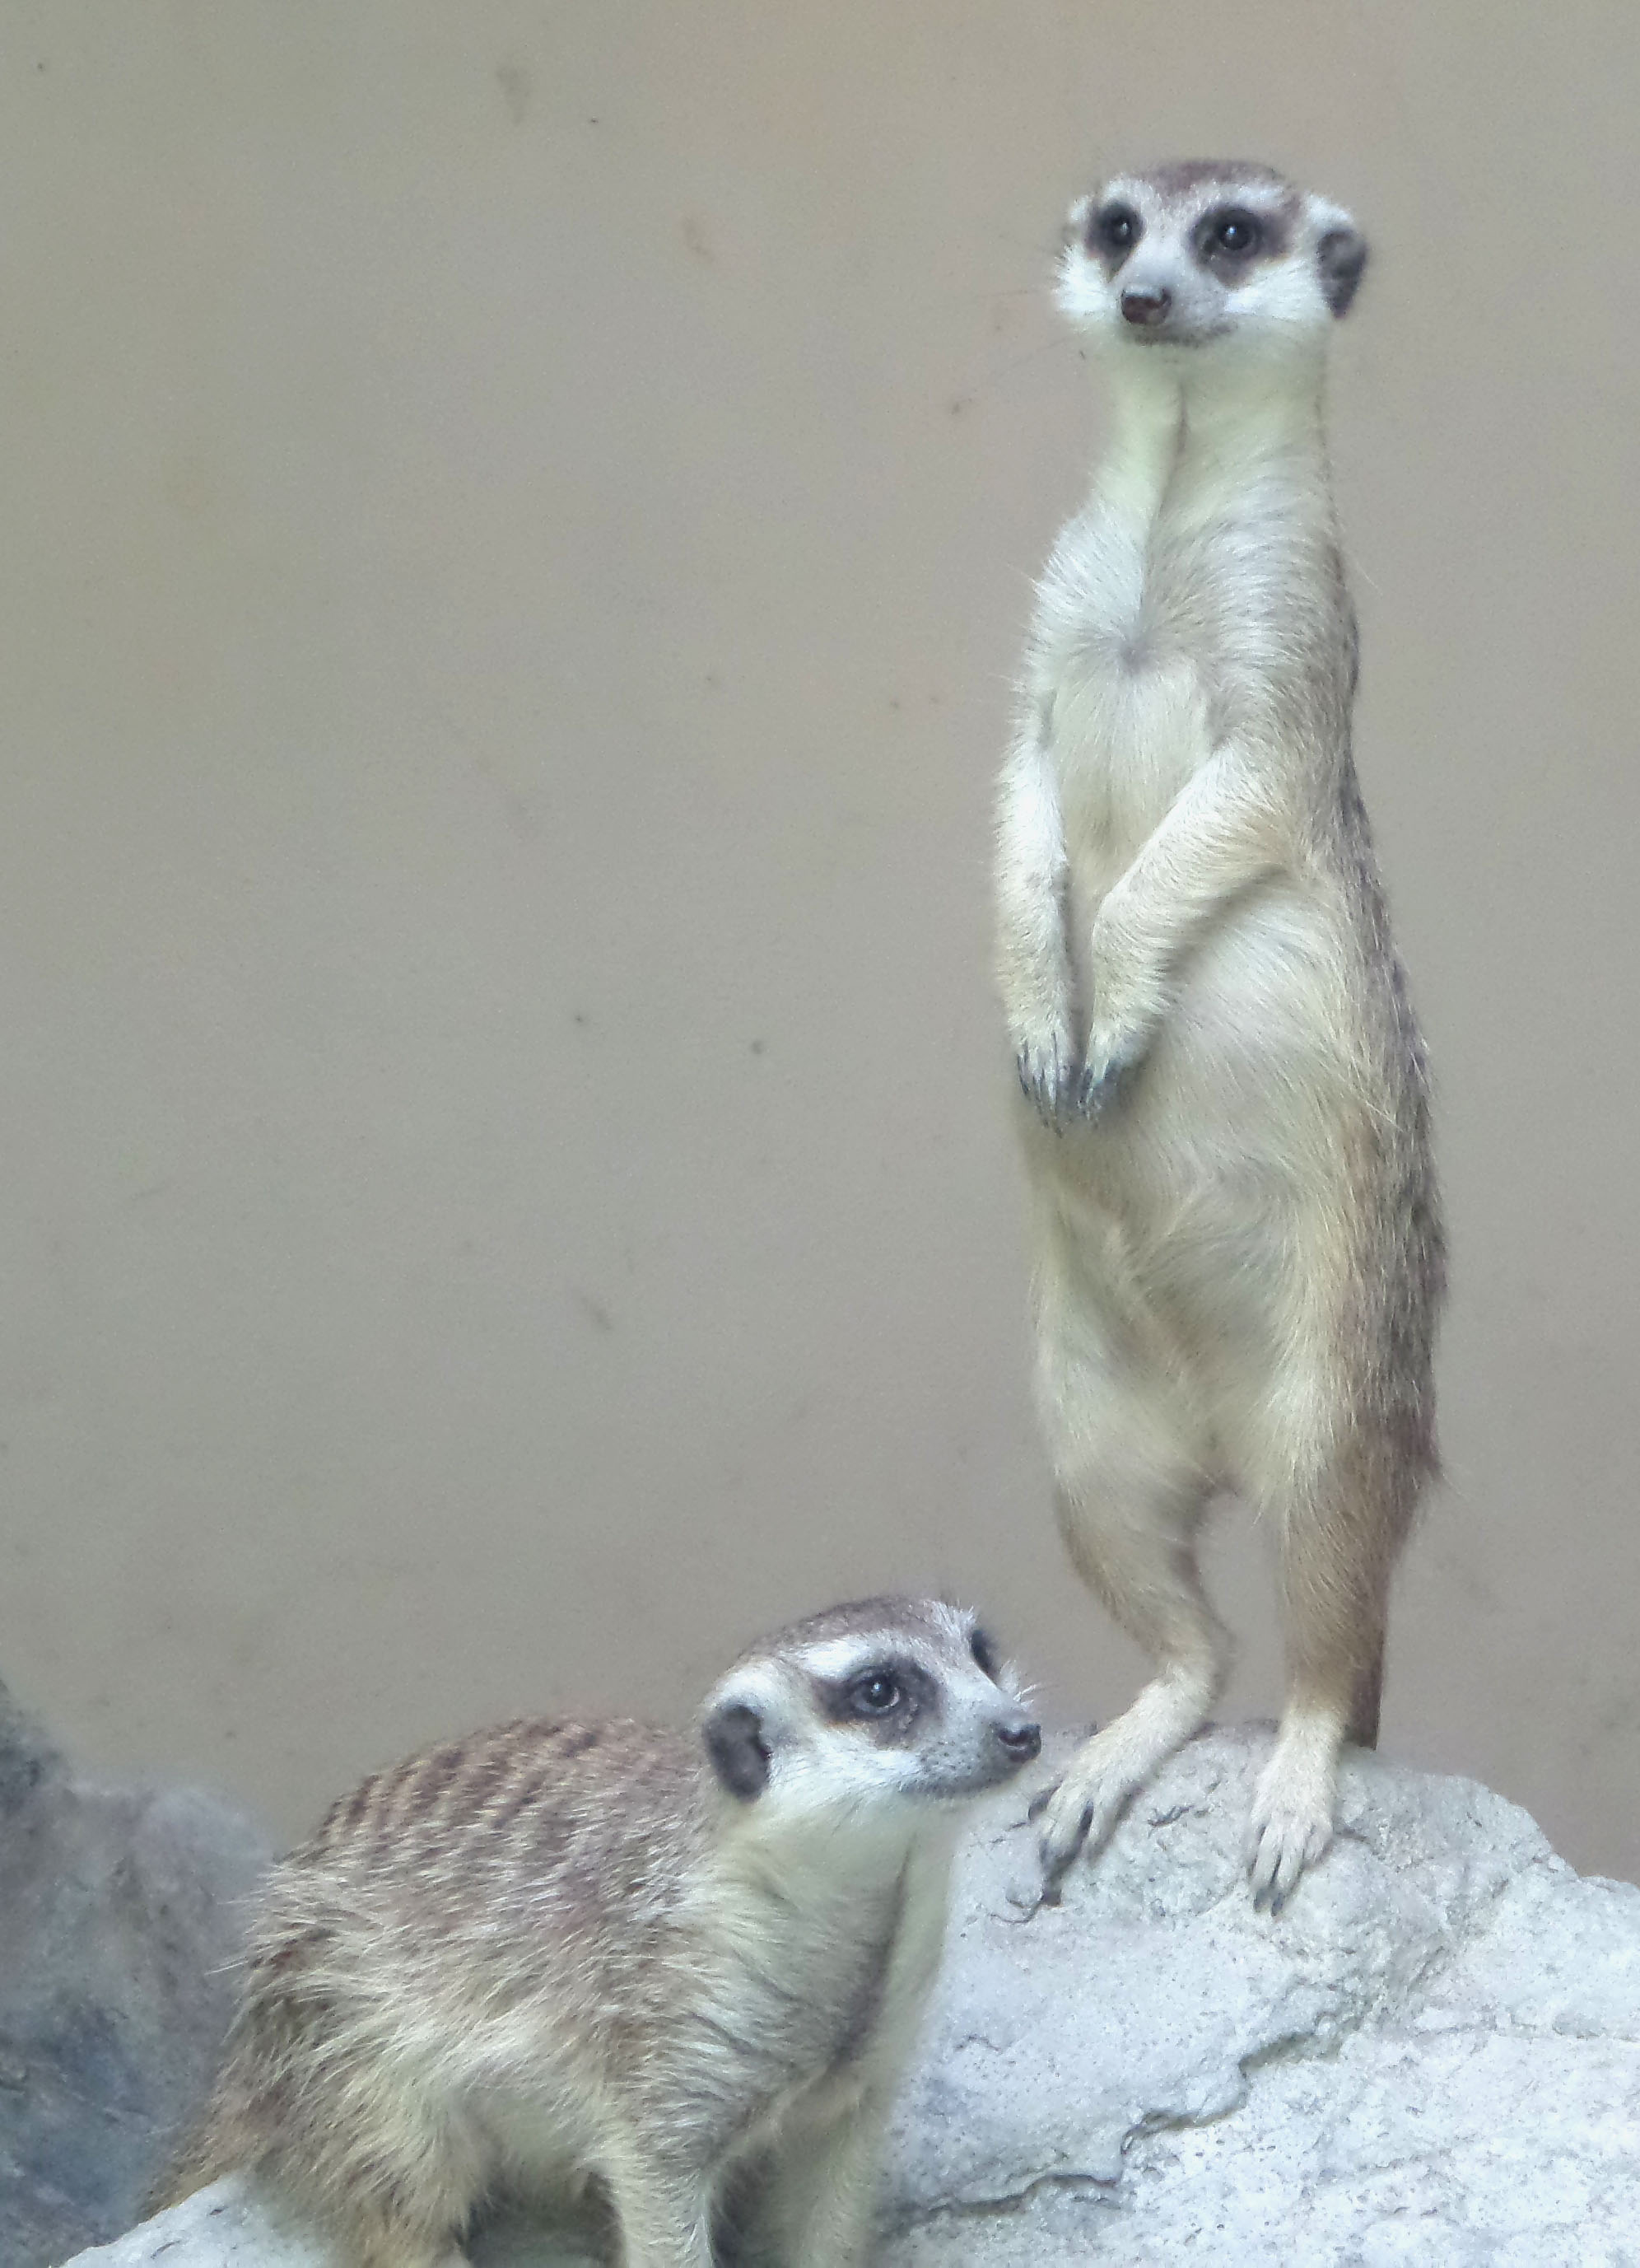 Meerkats, African, Alert, Guarding, Mammals, HQ Photo